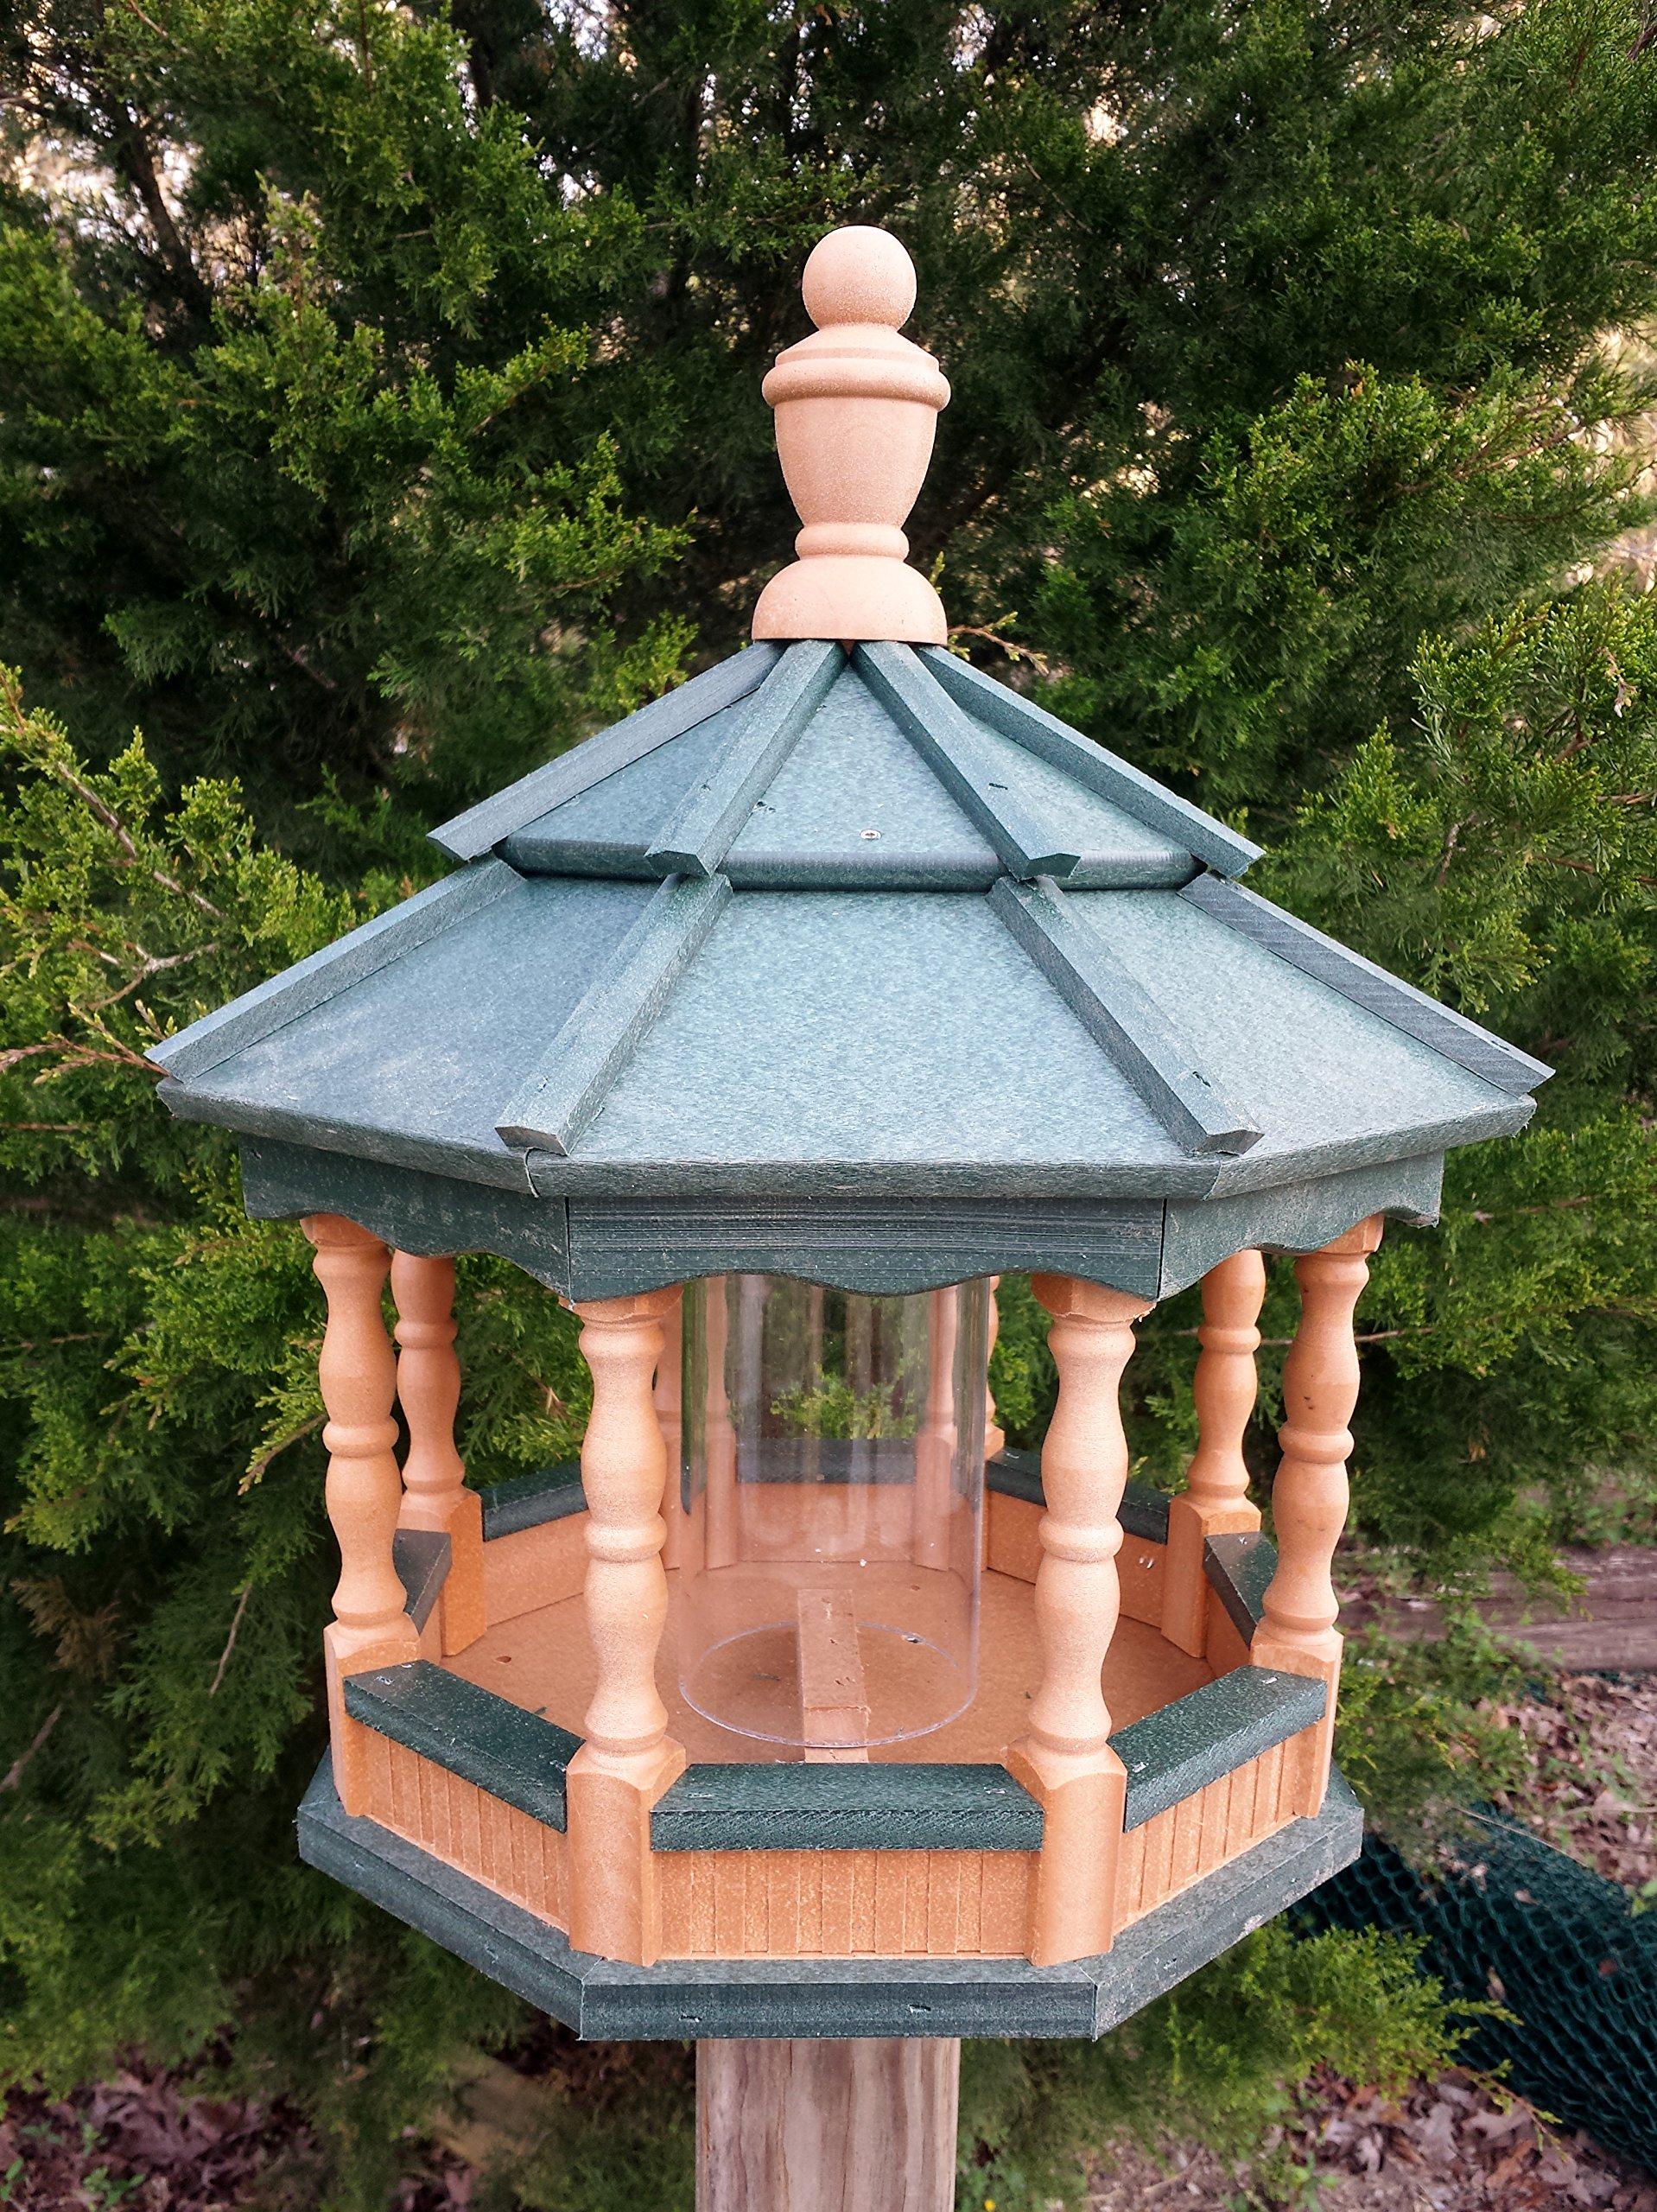 Poly Bird Feeder Amish Gazebo Handcrafted Homemade Medium Cedar / Green Roof